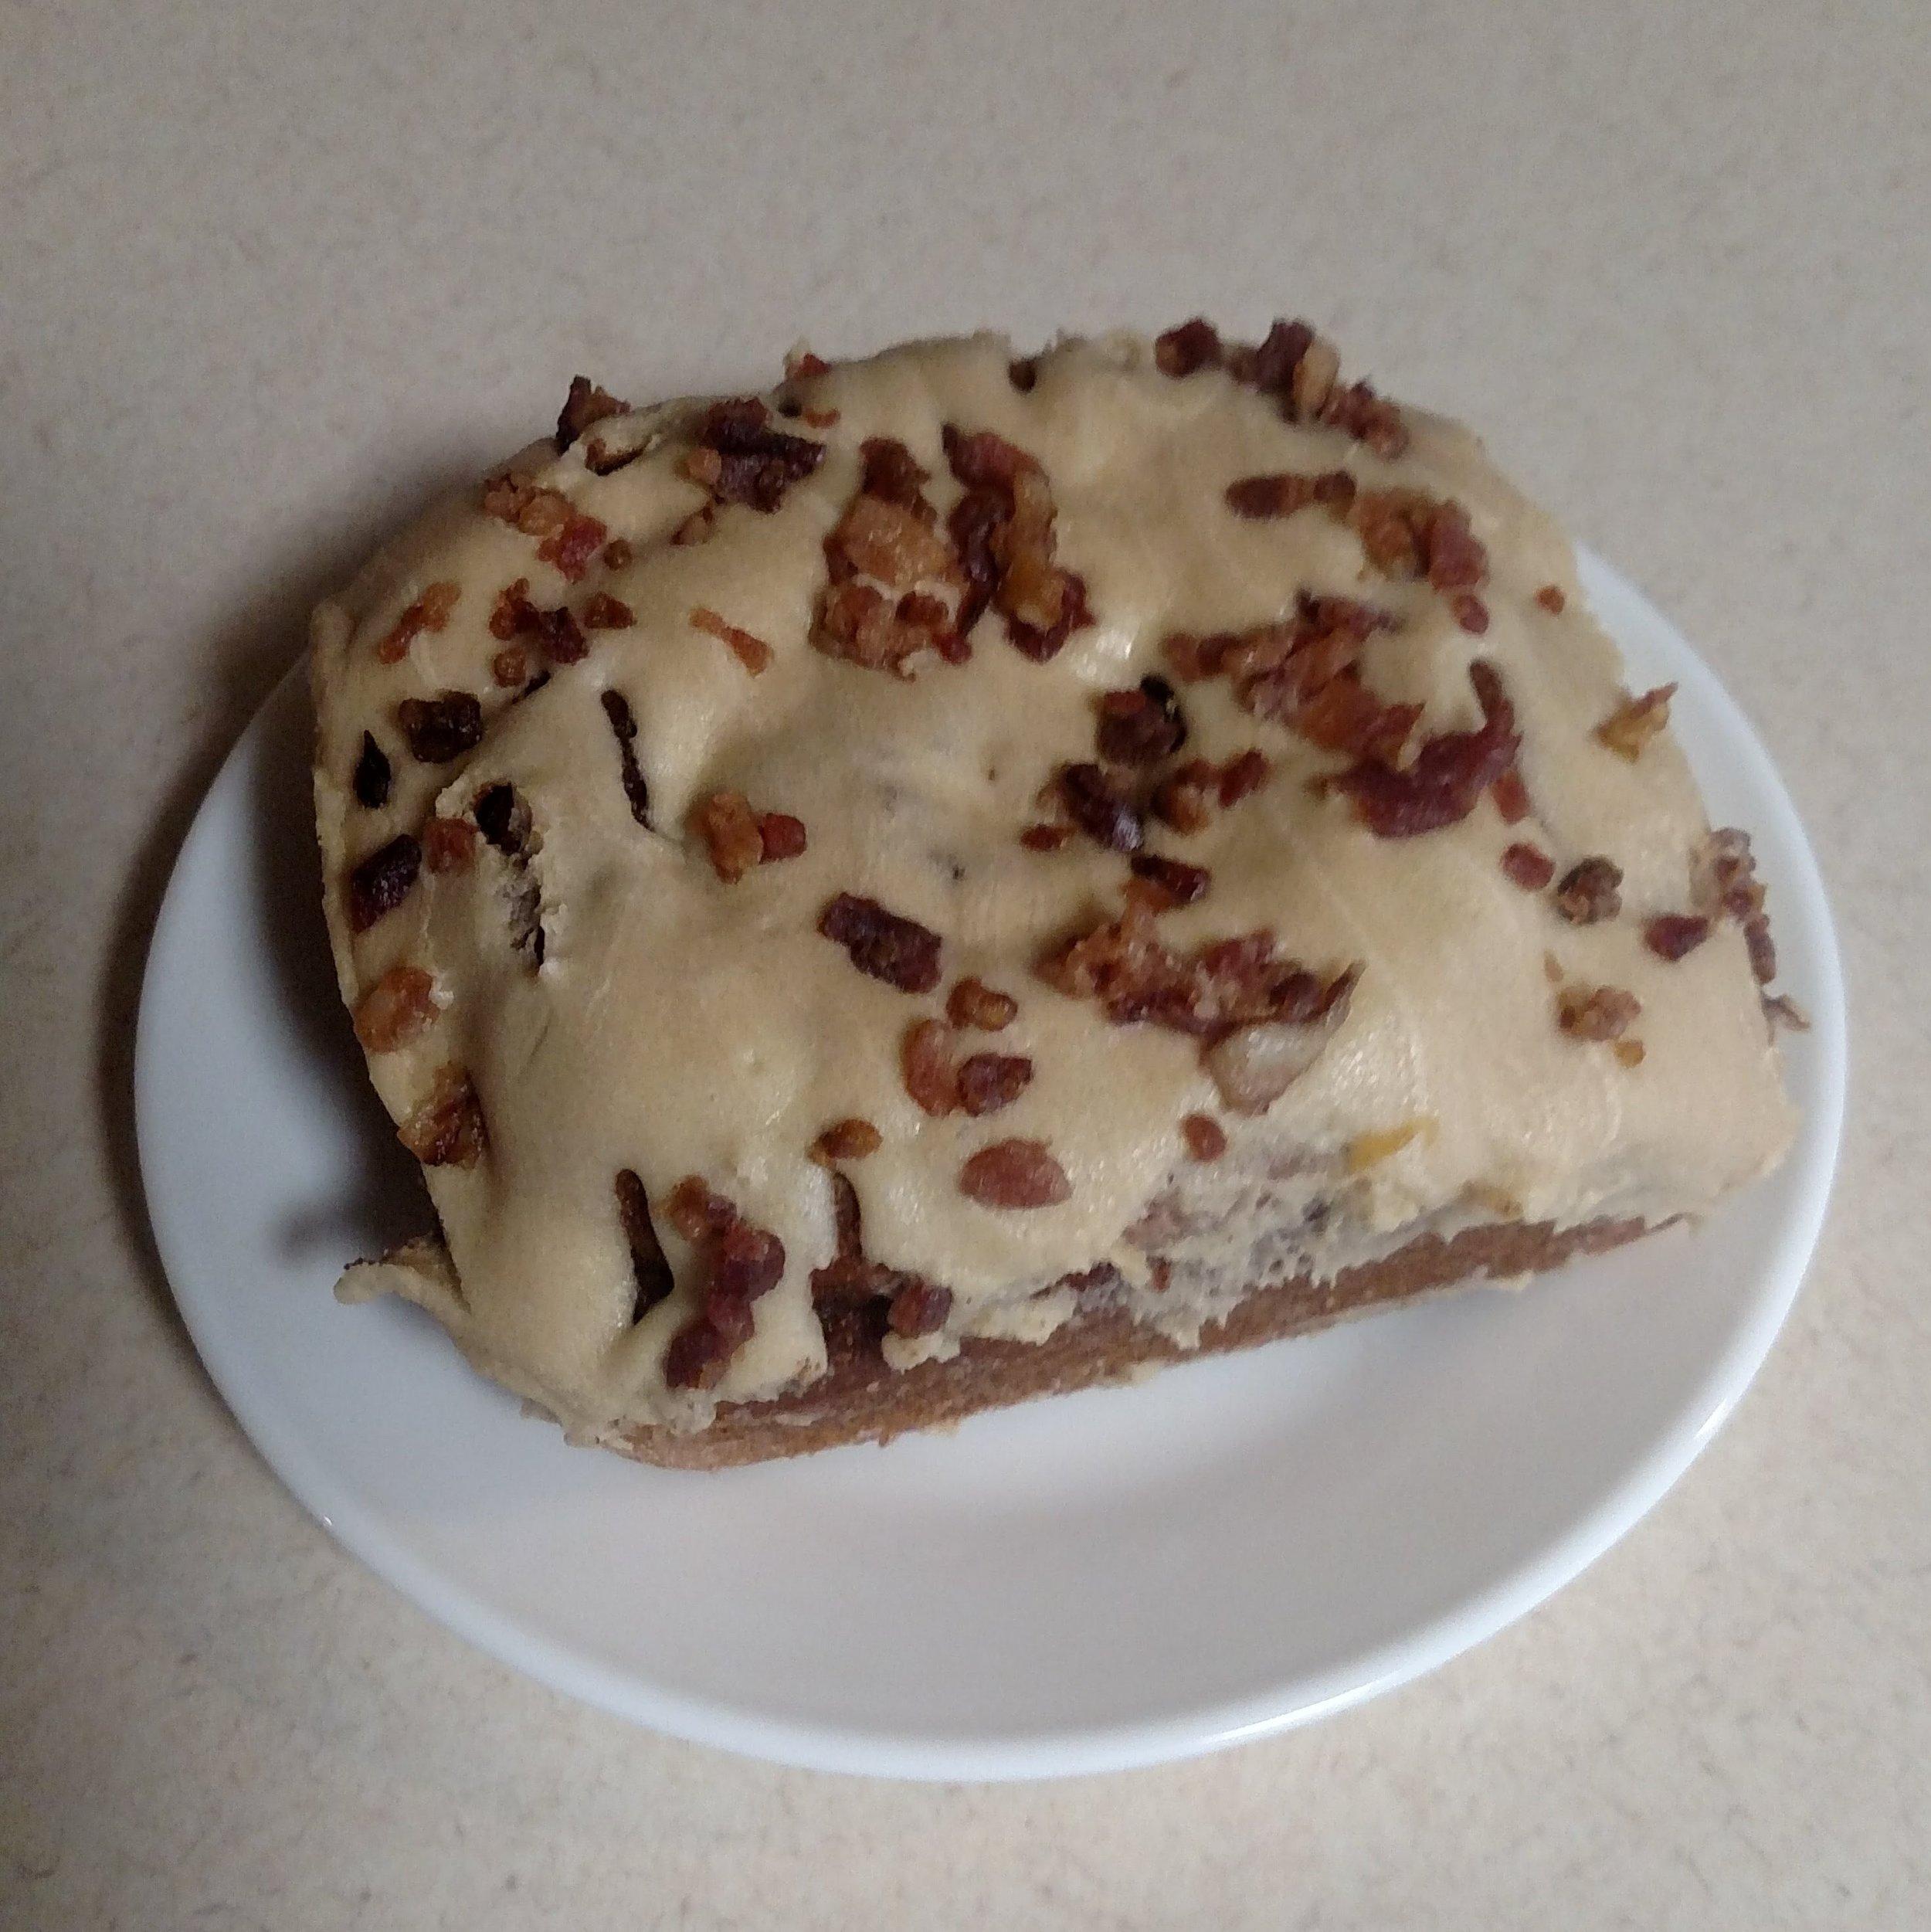 Maple Bacon Cinnamom Grand Blanc, MI